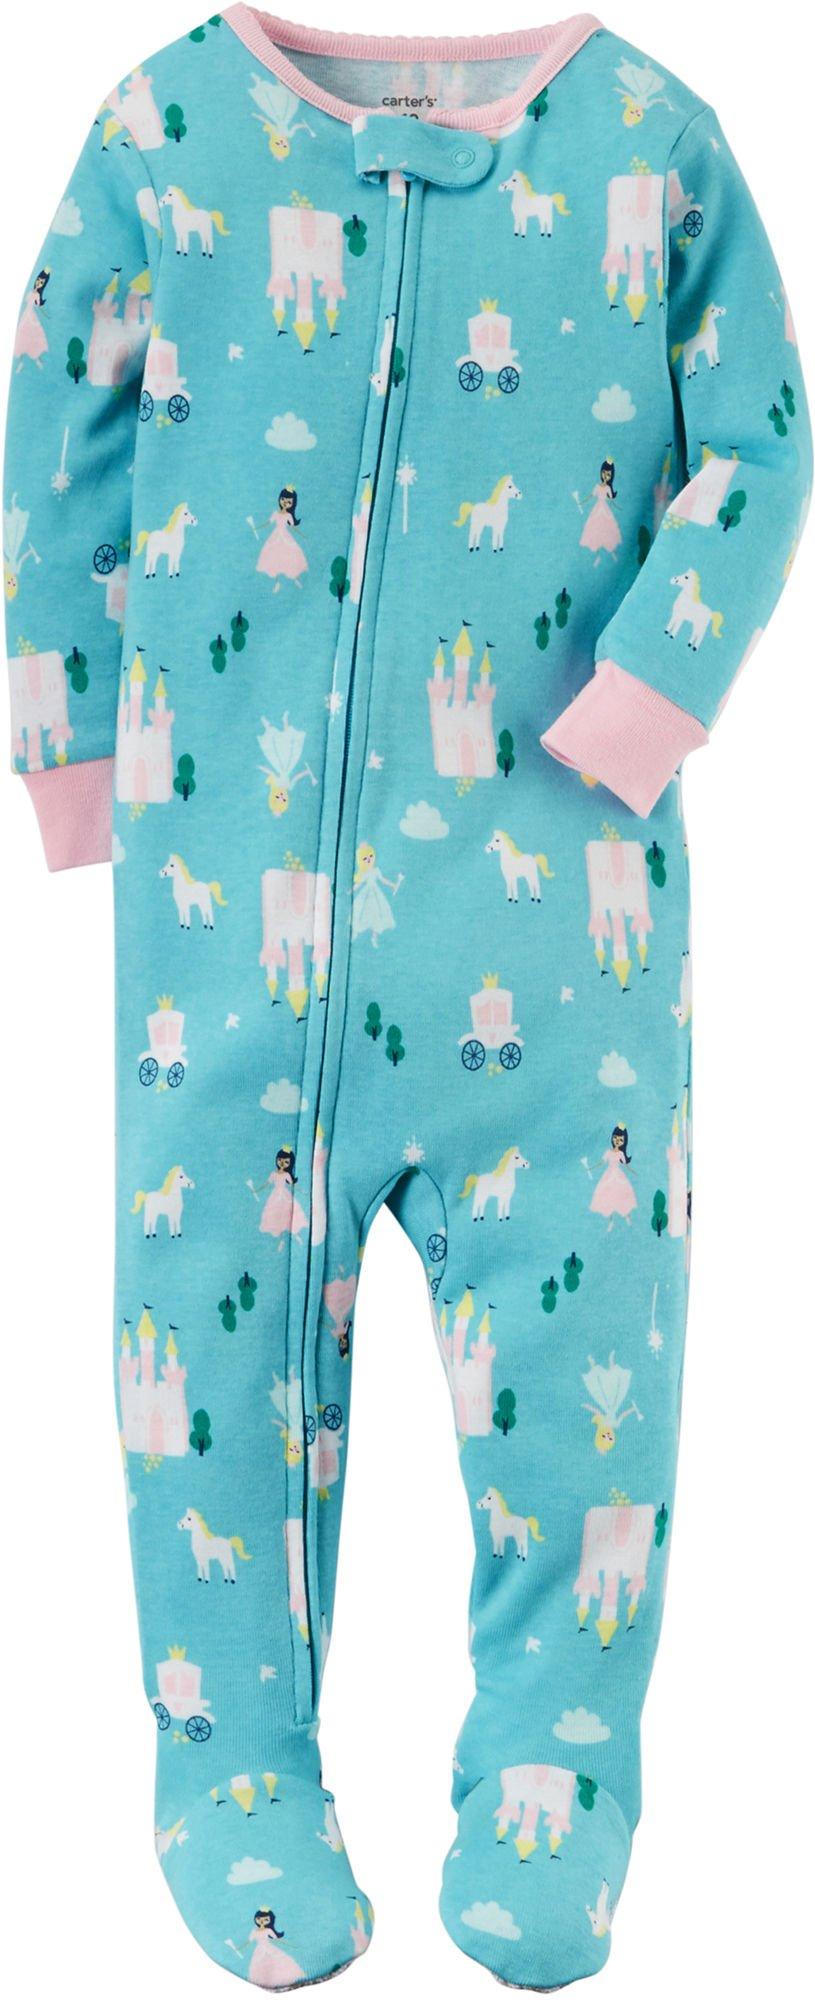 Carter's Girls' 18M-4T Princess Print One Piece Cotton Pajamas 18 Months